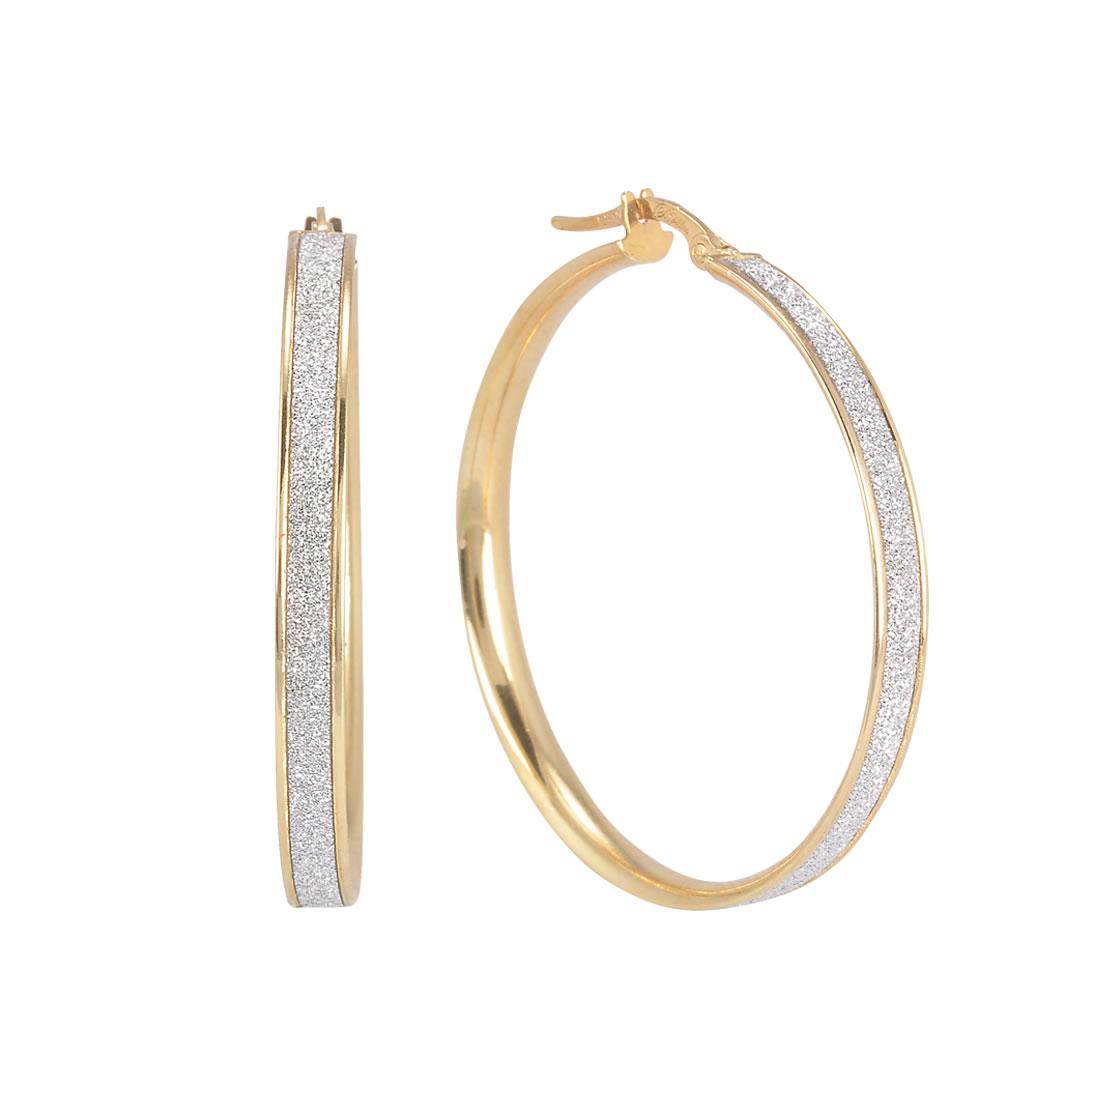 Bella Glam Earrings